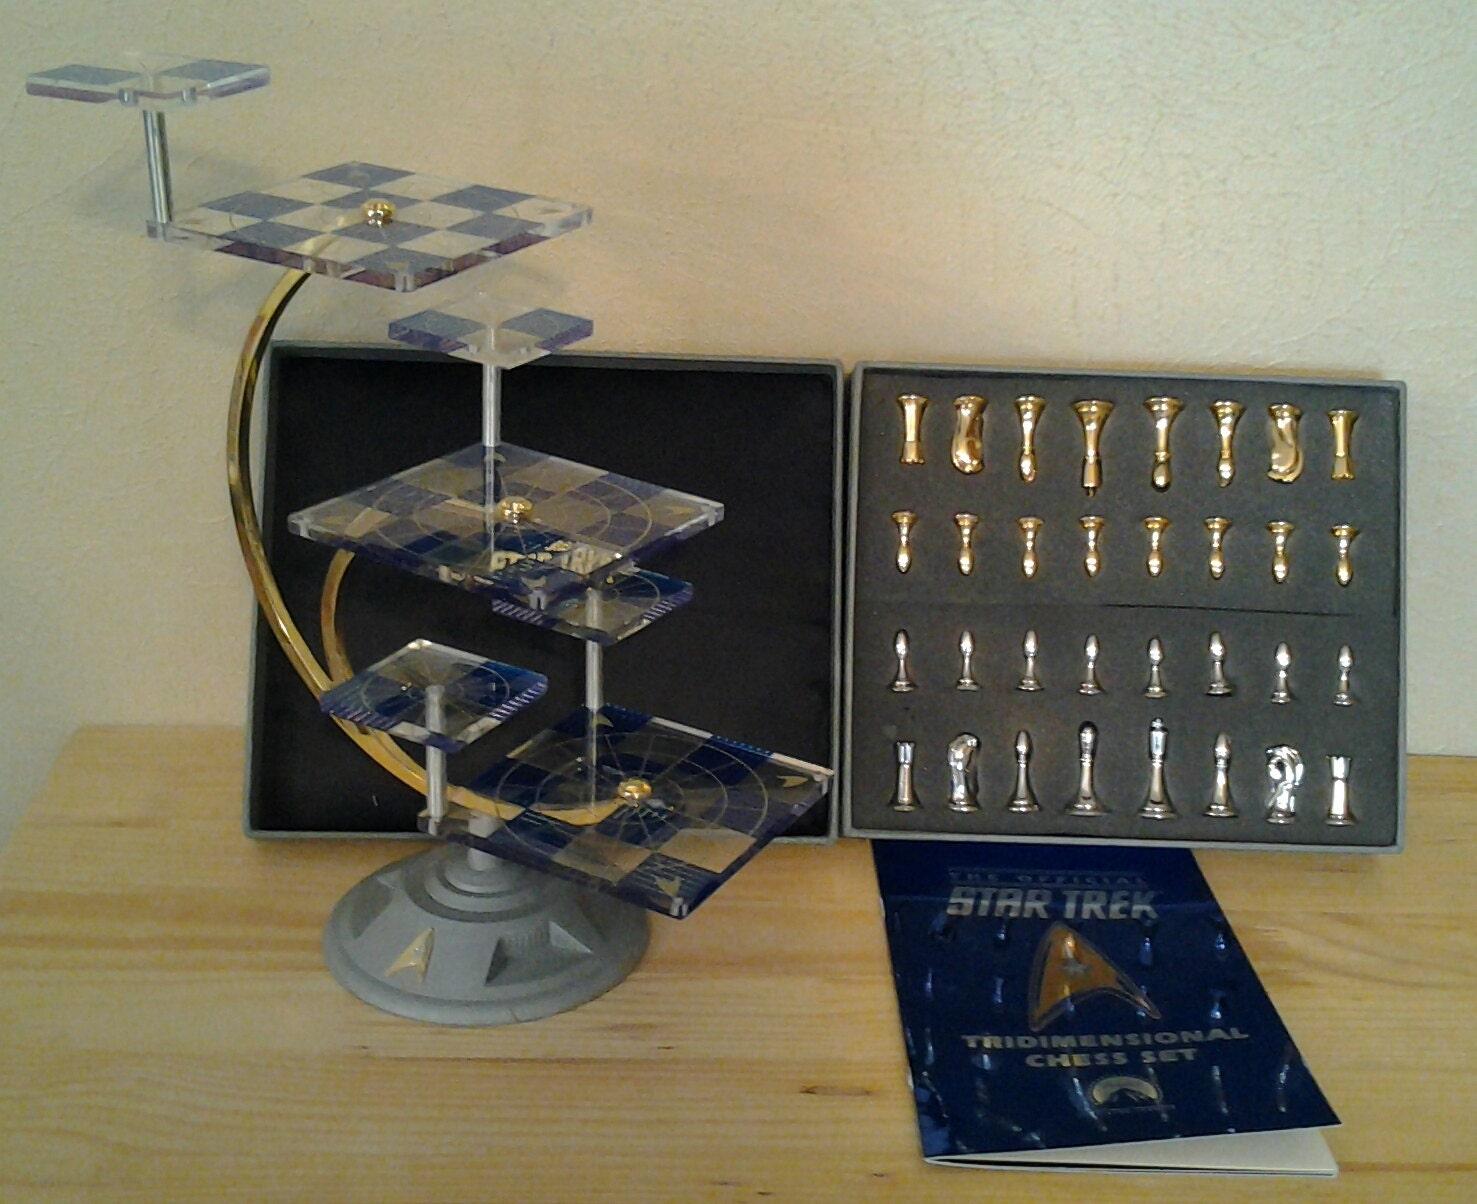 Star trek tri dimensional chess set by the franklin by bobingalong - Tri dimensional chess ...